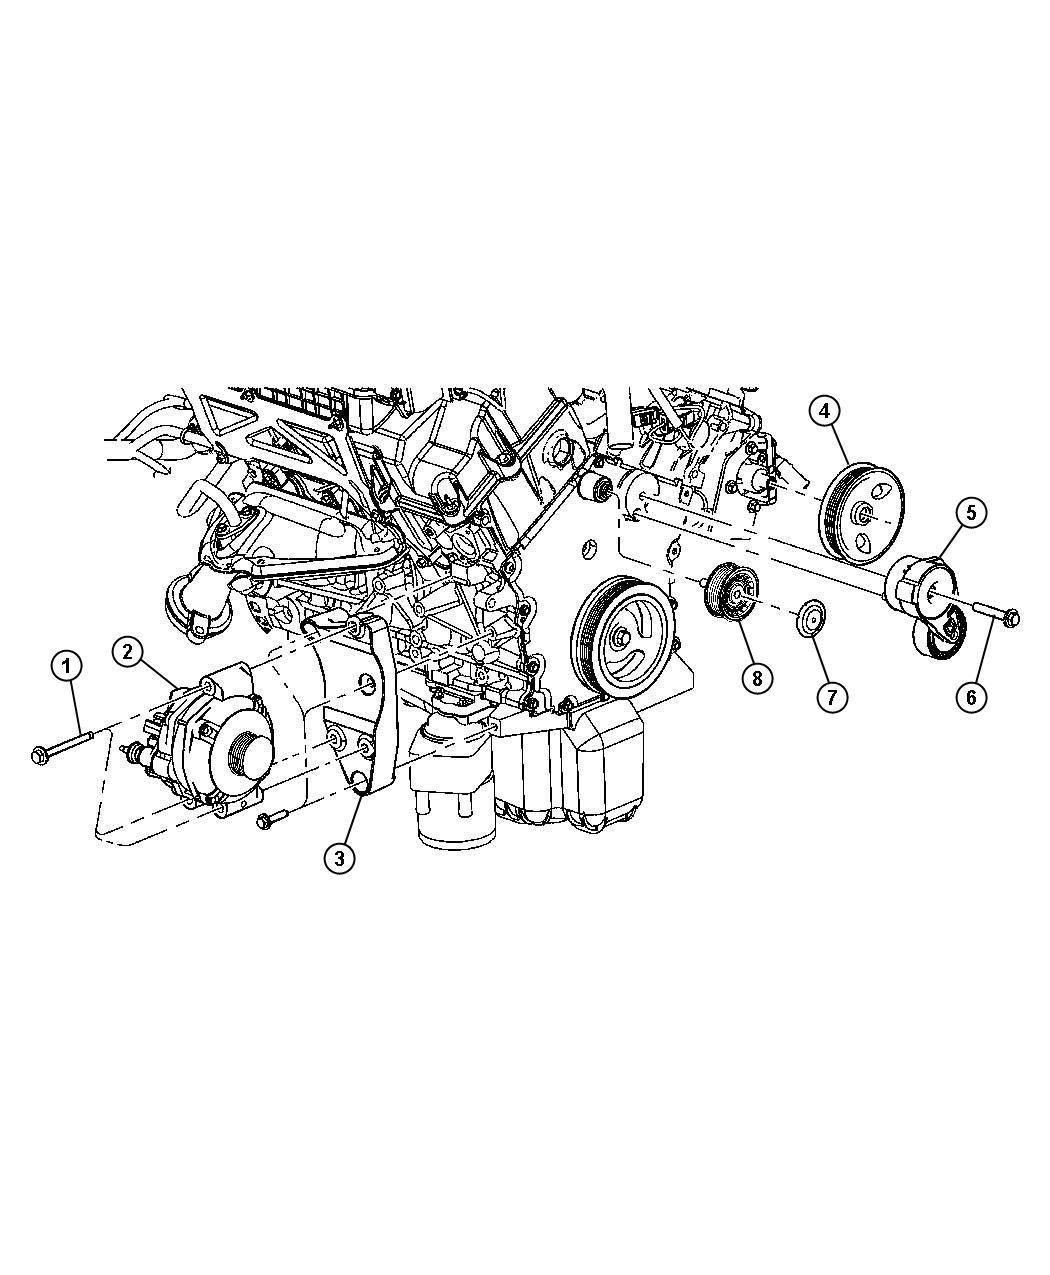 2010 Dodge Viper Generator. Engine. [160 amp alternator